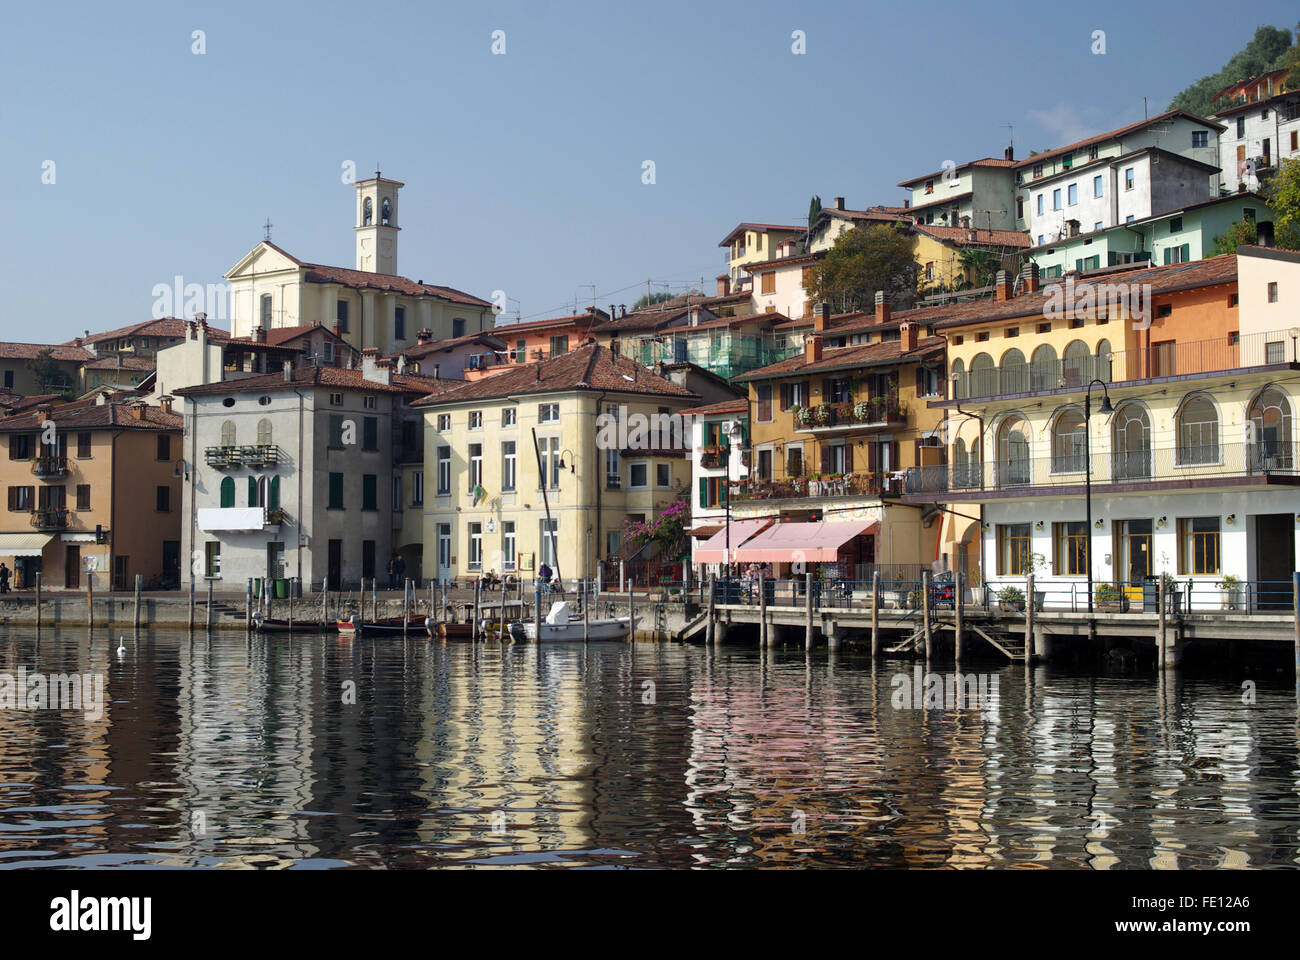 Town of Peschiera Maraglio, Iseo lake, Italy - Stock Image